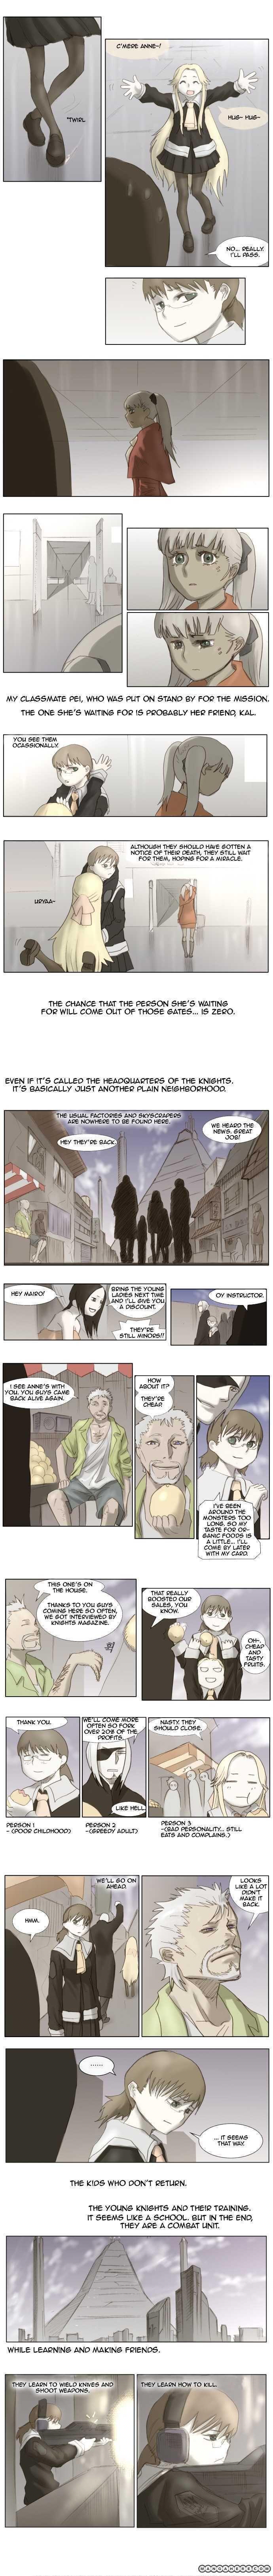 Knight Run 6 Page 2